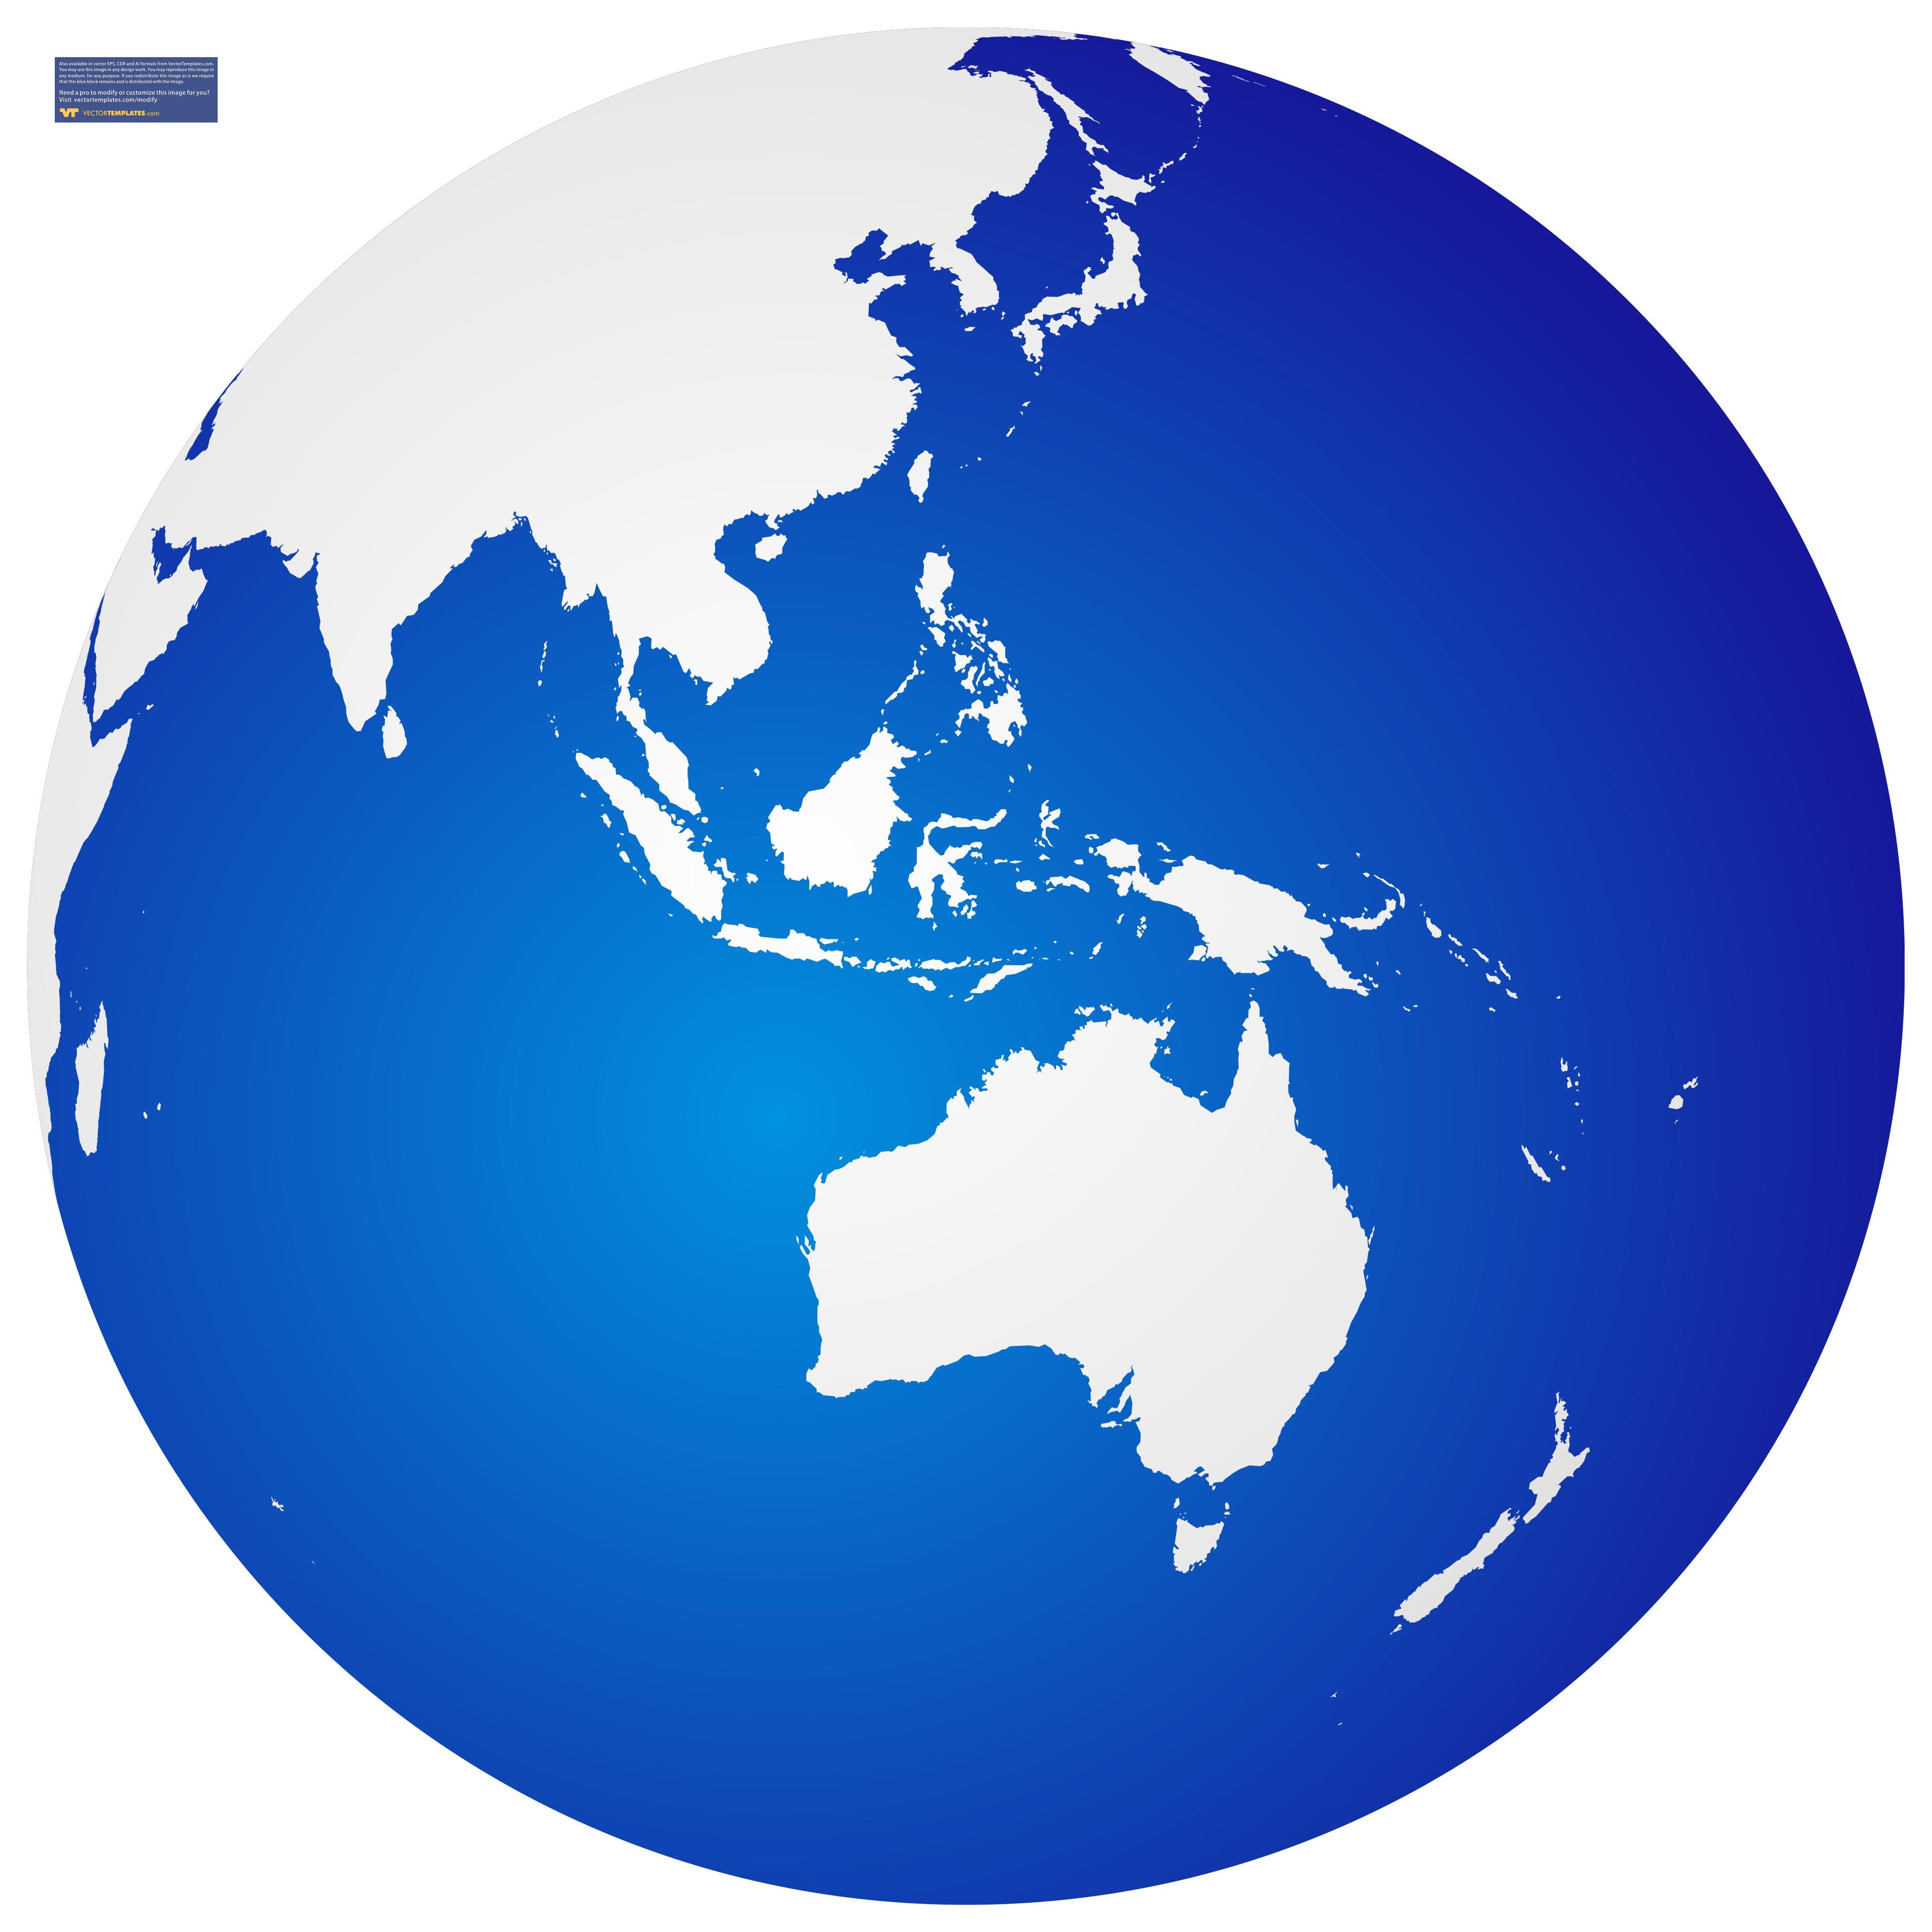 4021x4021 Free Png Hd World Globe Transparent Hd World Globe.png Images